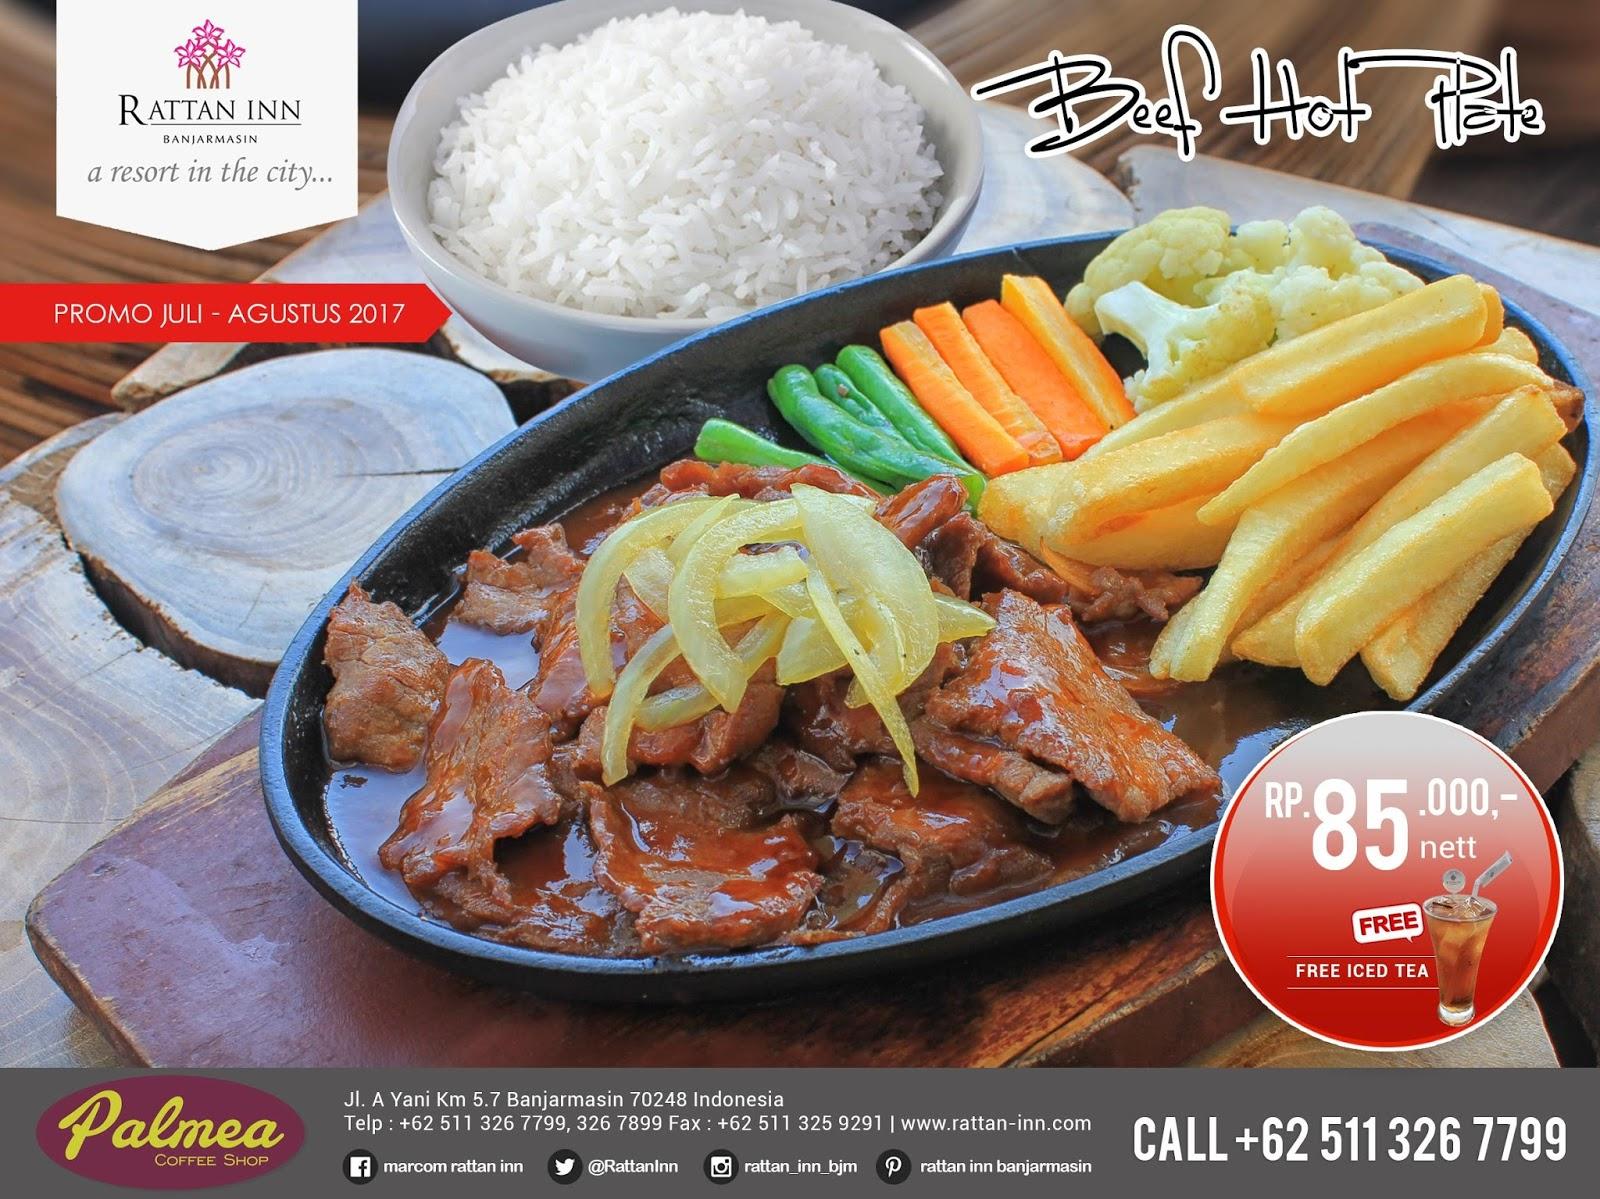 Palmea Rattan Inn Banjarmasin Hotelier Indonesia Food And Restaurants